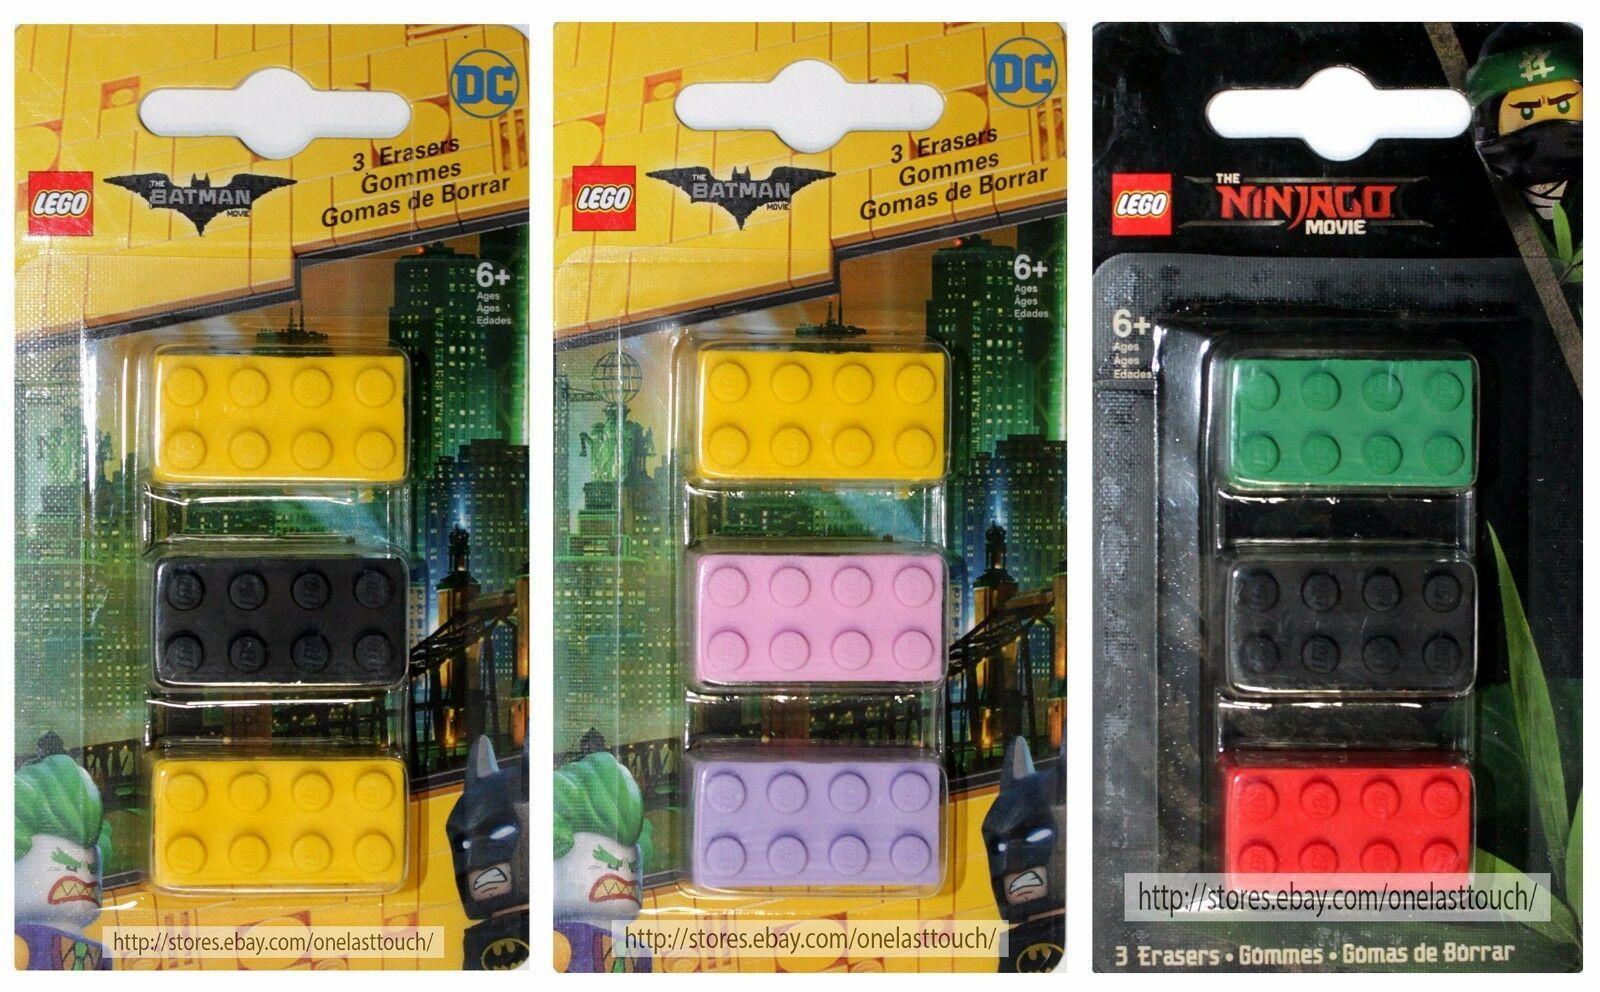 SANTOKI* 3pc LEGO MOVIE Brick Shaped Erasers BATMAN+NINJAGO New! *YOU CHOOSE*